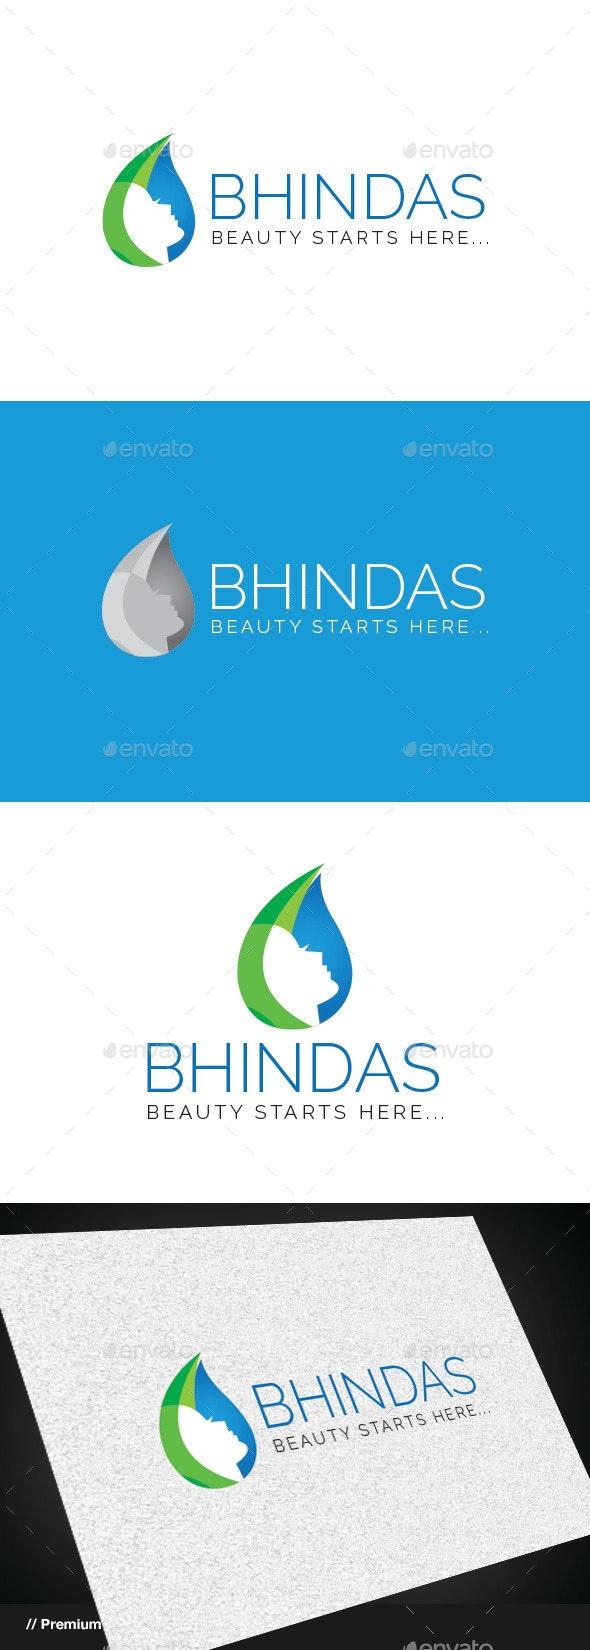 Bhindas Beauty Logo - Nature Logo Templates